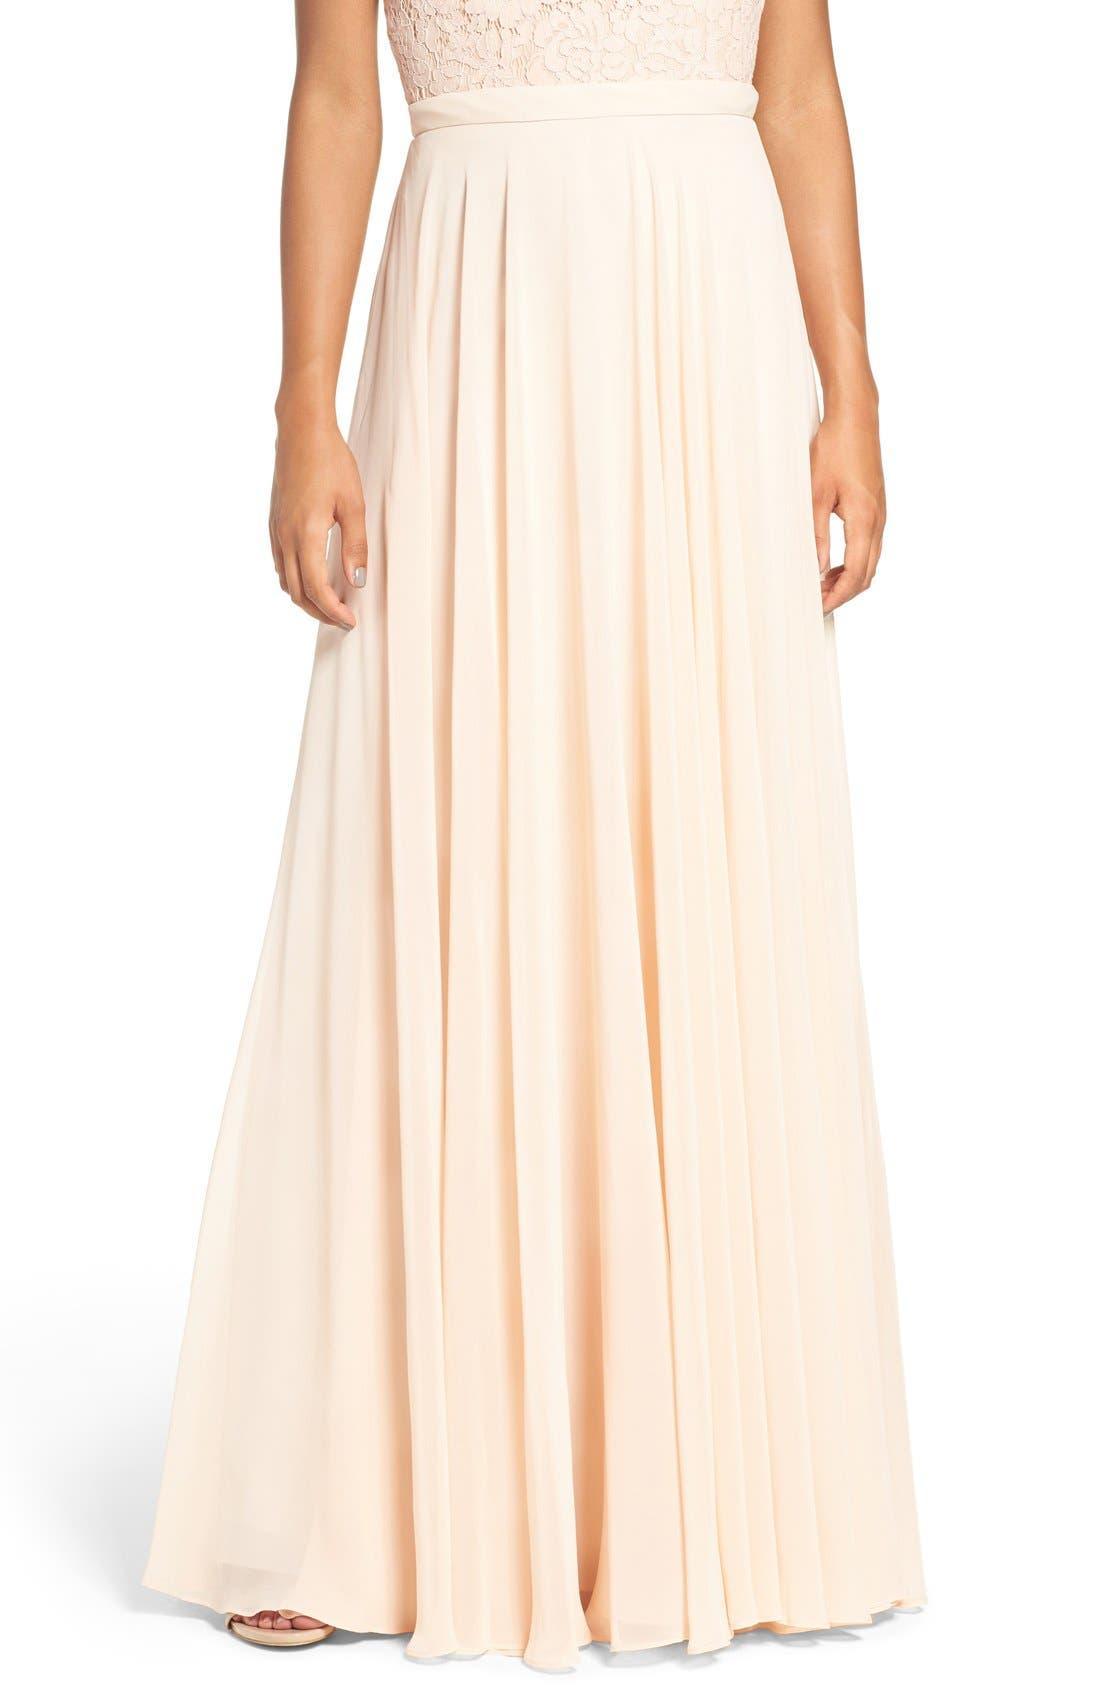 Alternate Image 1 Selected - Jenny Yoo 'Hampton' Long A-Line Chiffon Skirt